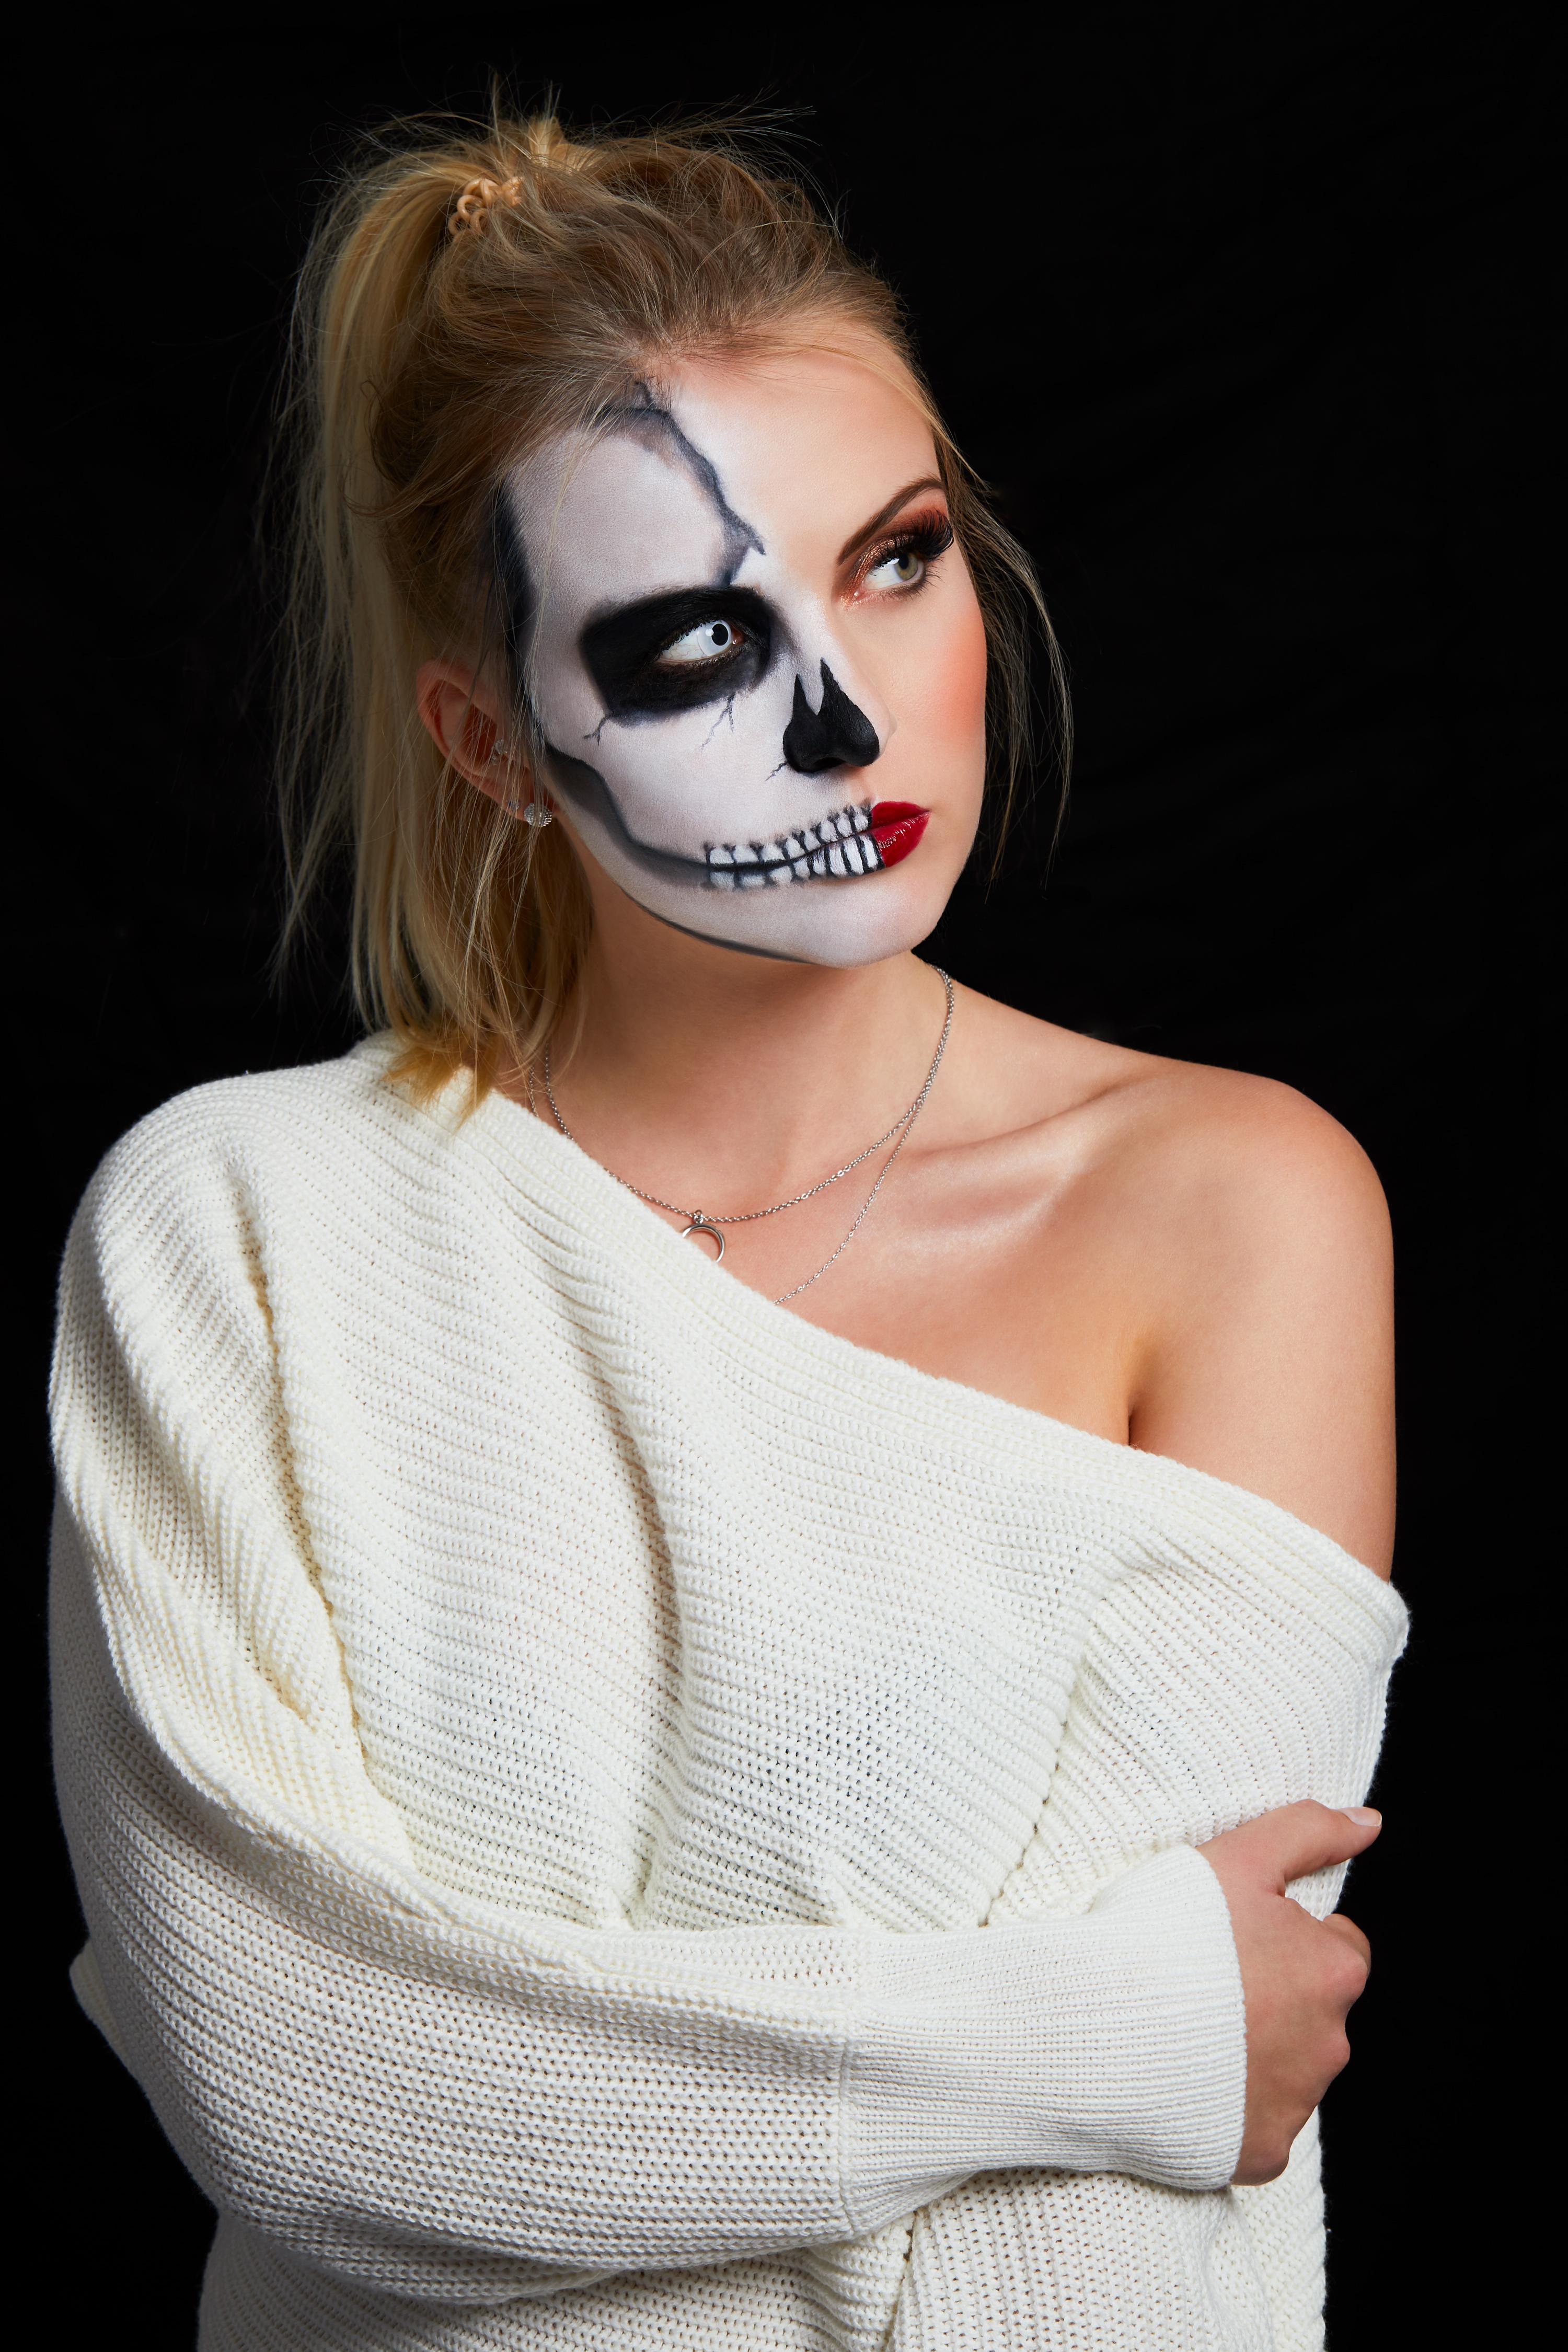 halloween schminke selber machen. Black Bedroom Furniture Sets. Home Design Ideas